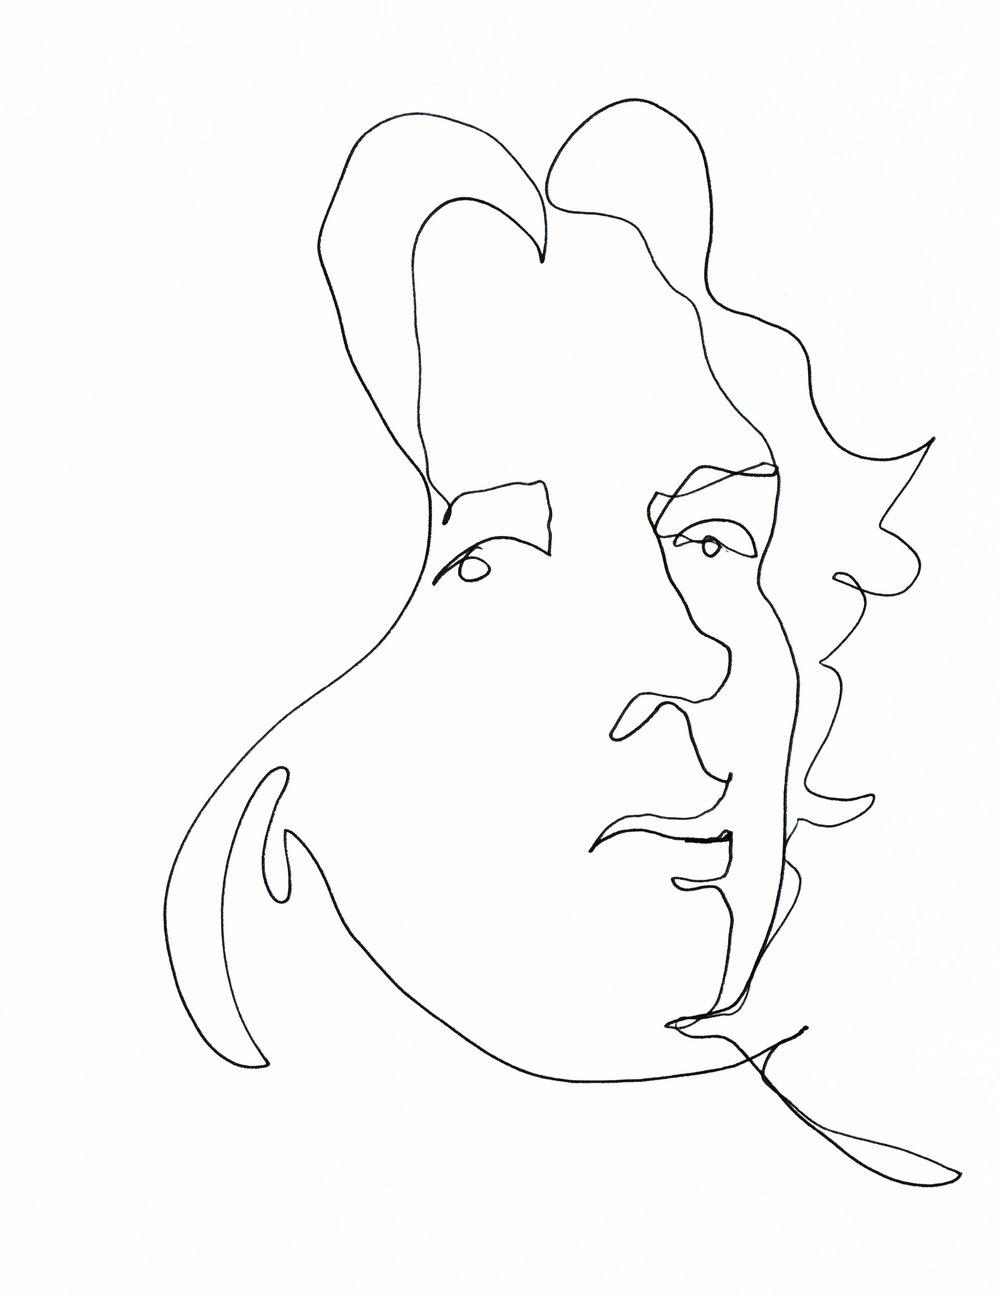 2_Image_Single Continuous Line_Oscar Wilde_©TamarLevi 179.jpg